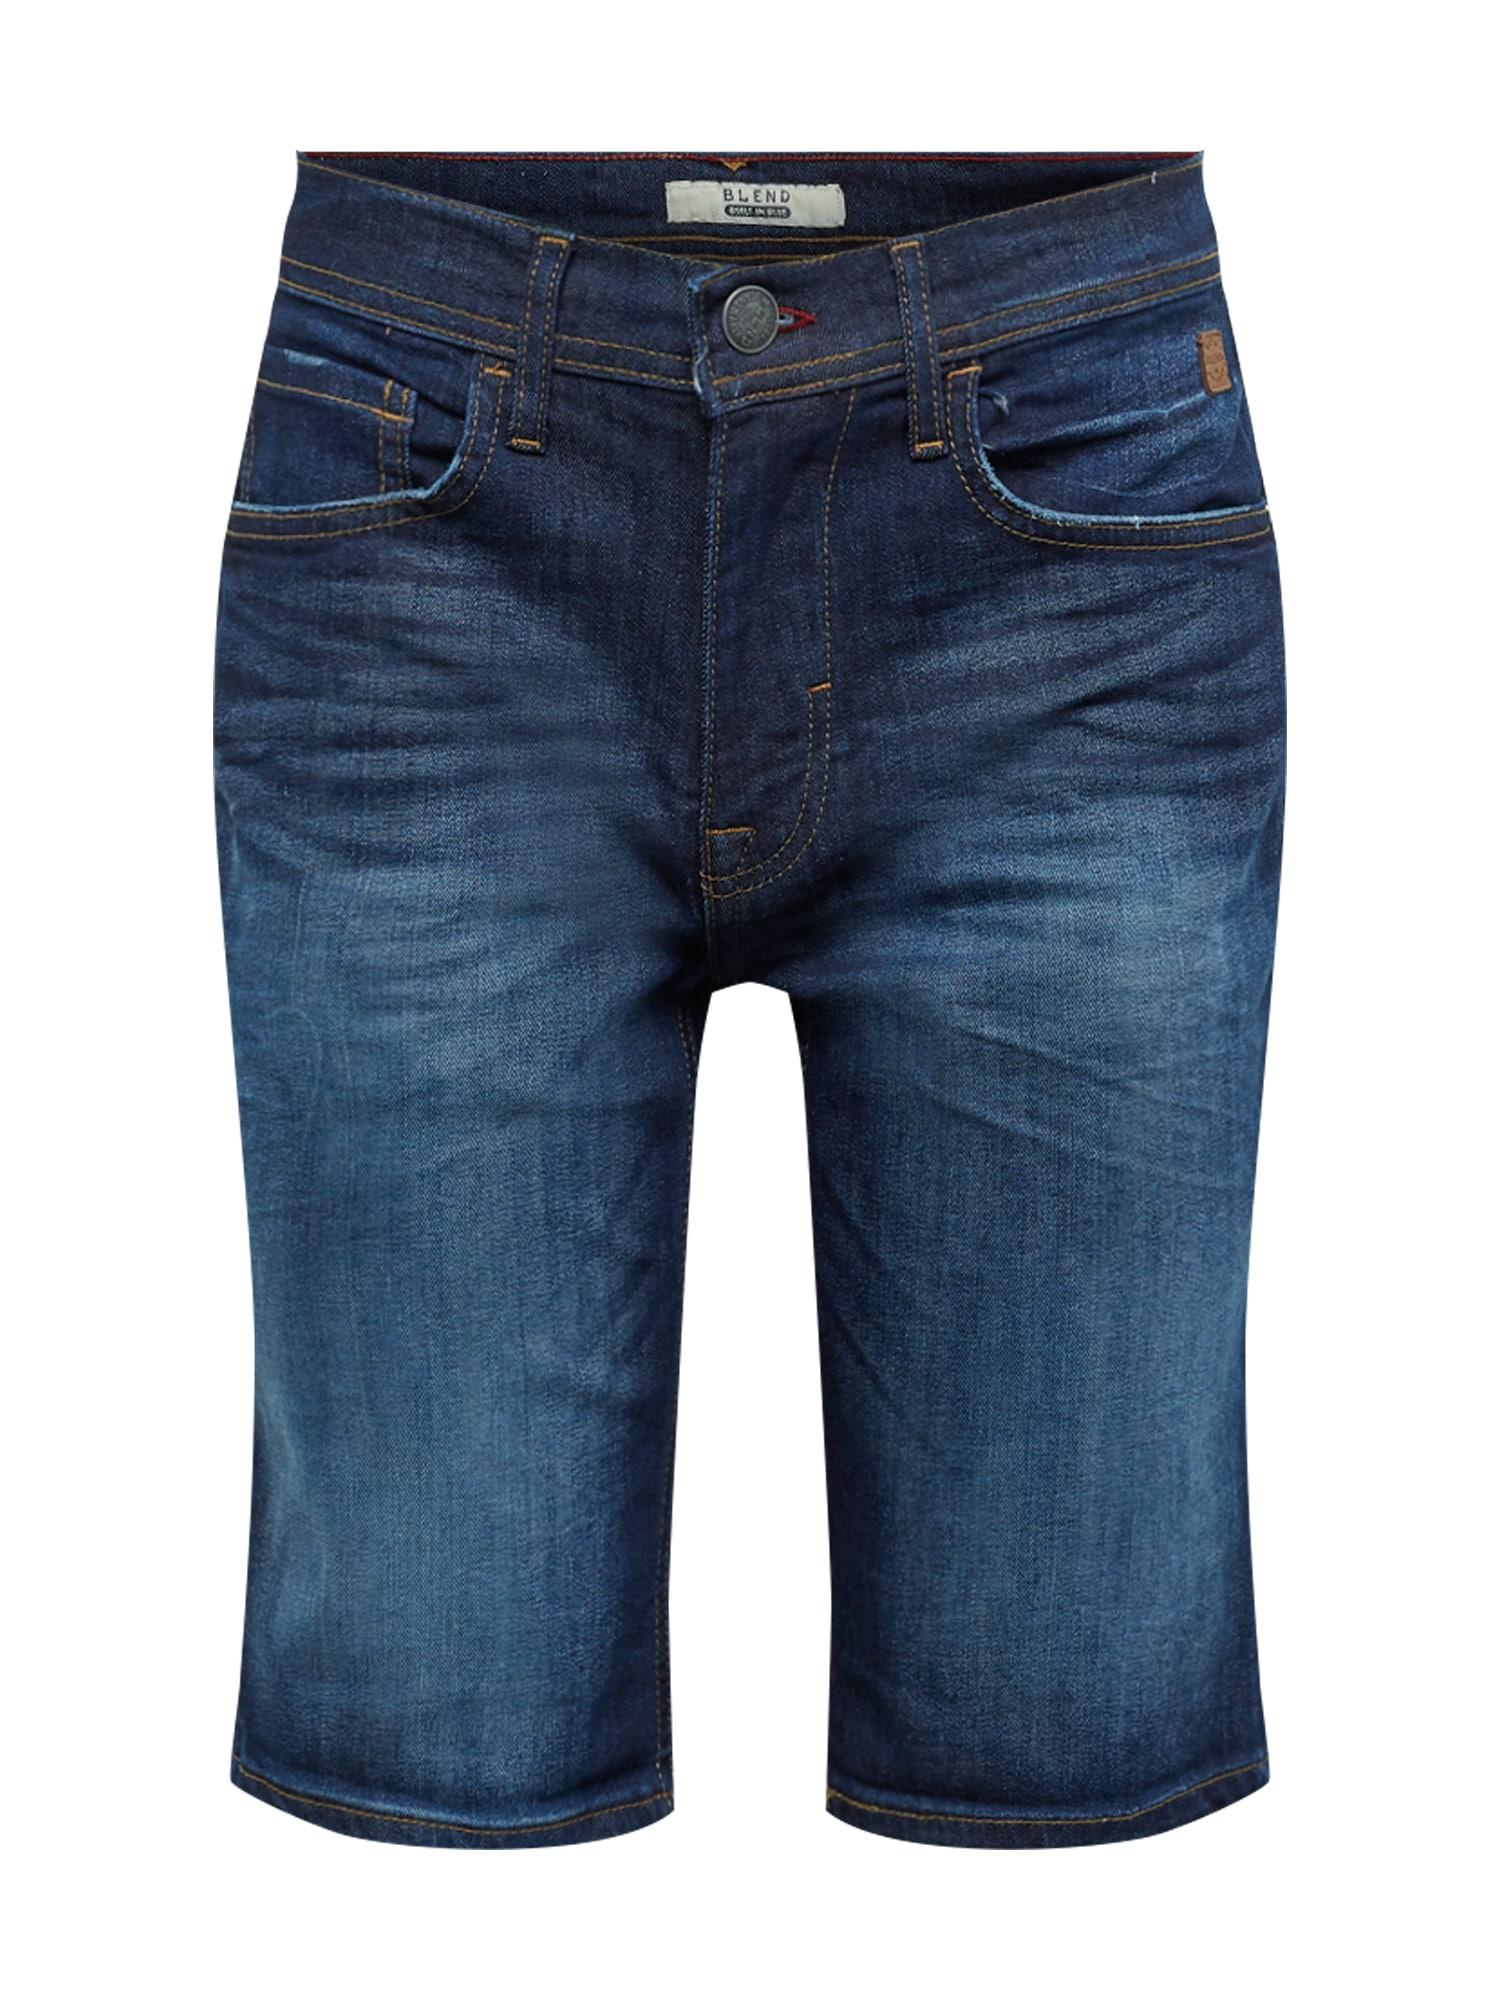 Džíny Denim Shorts Twister Slim tmavě modrá BLEND